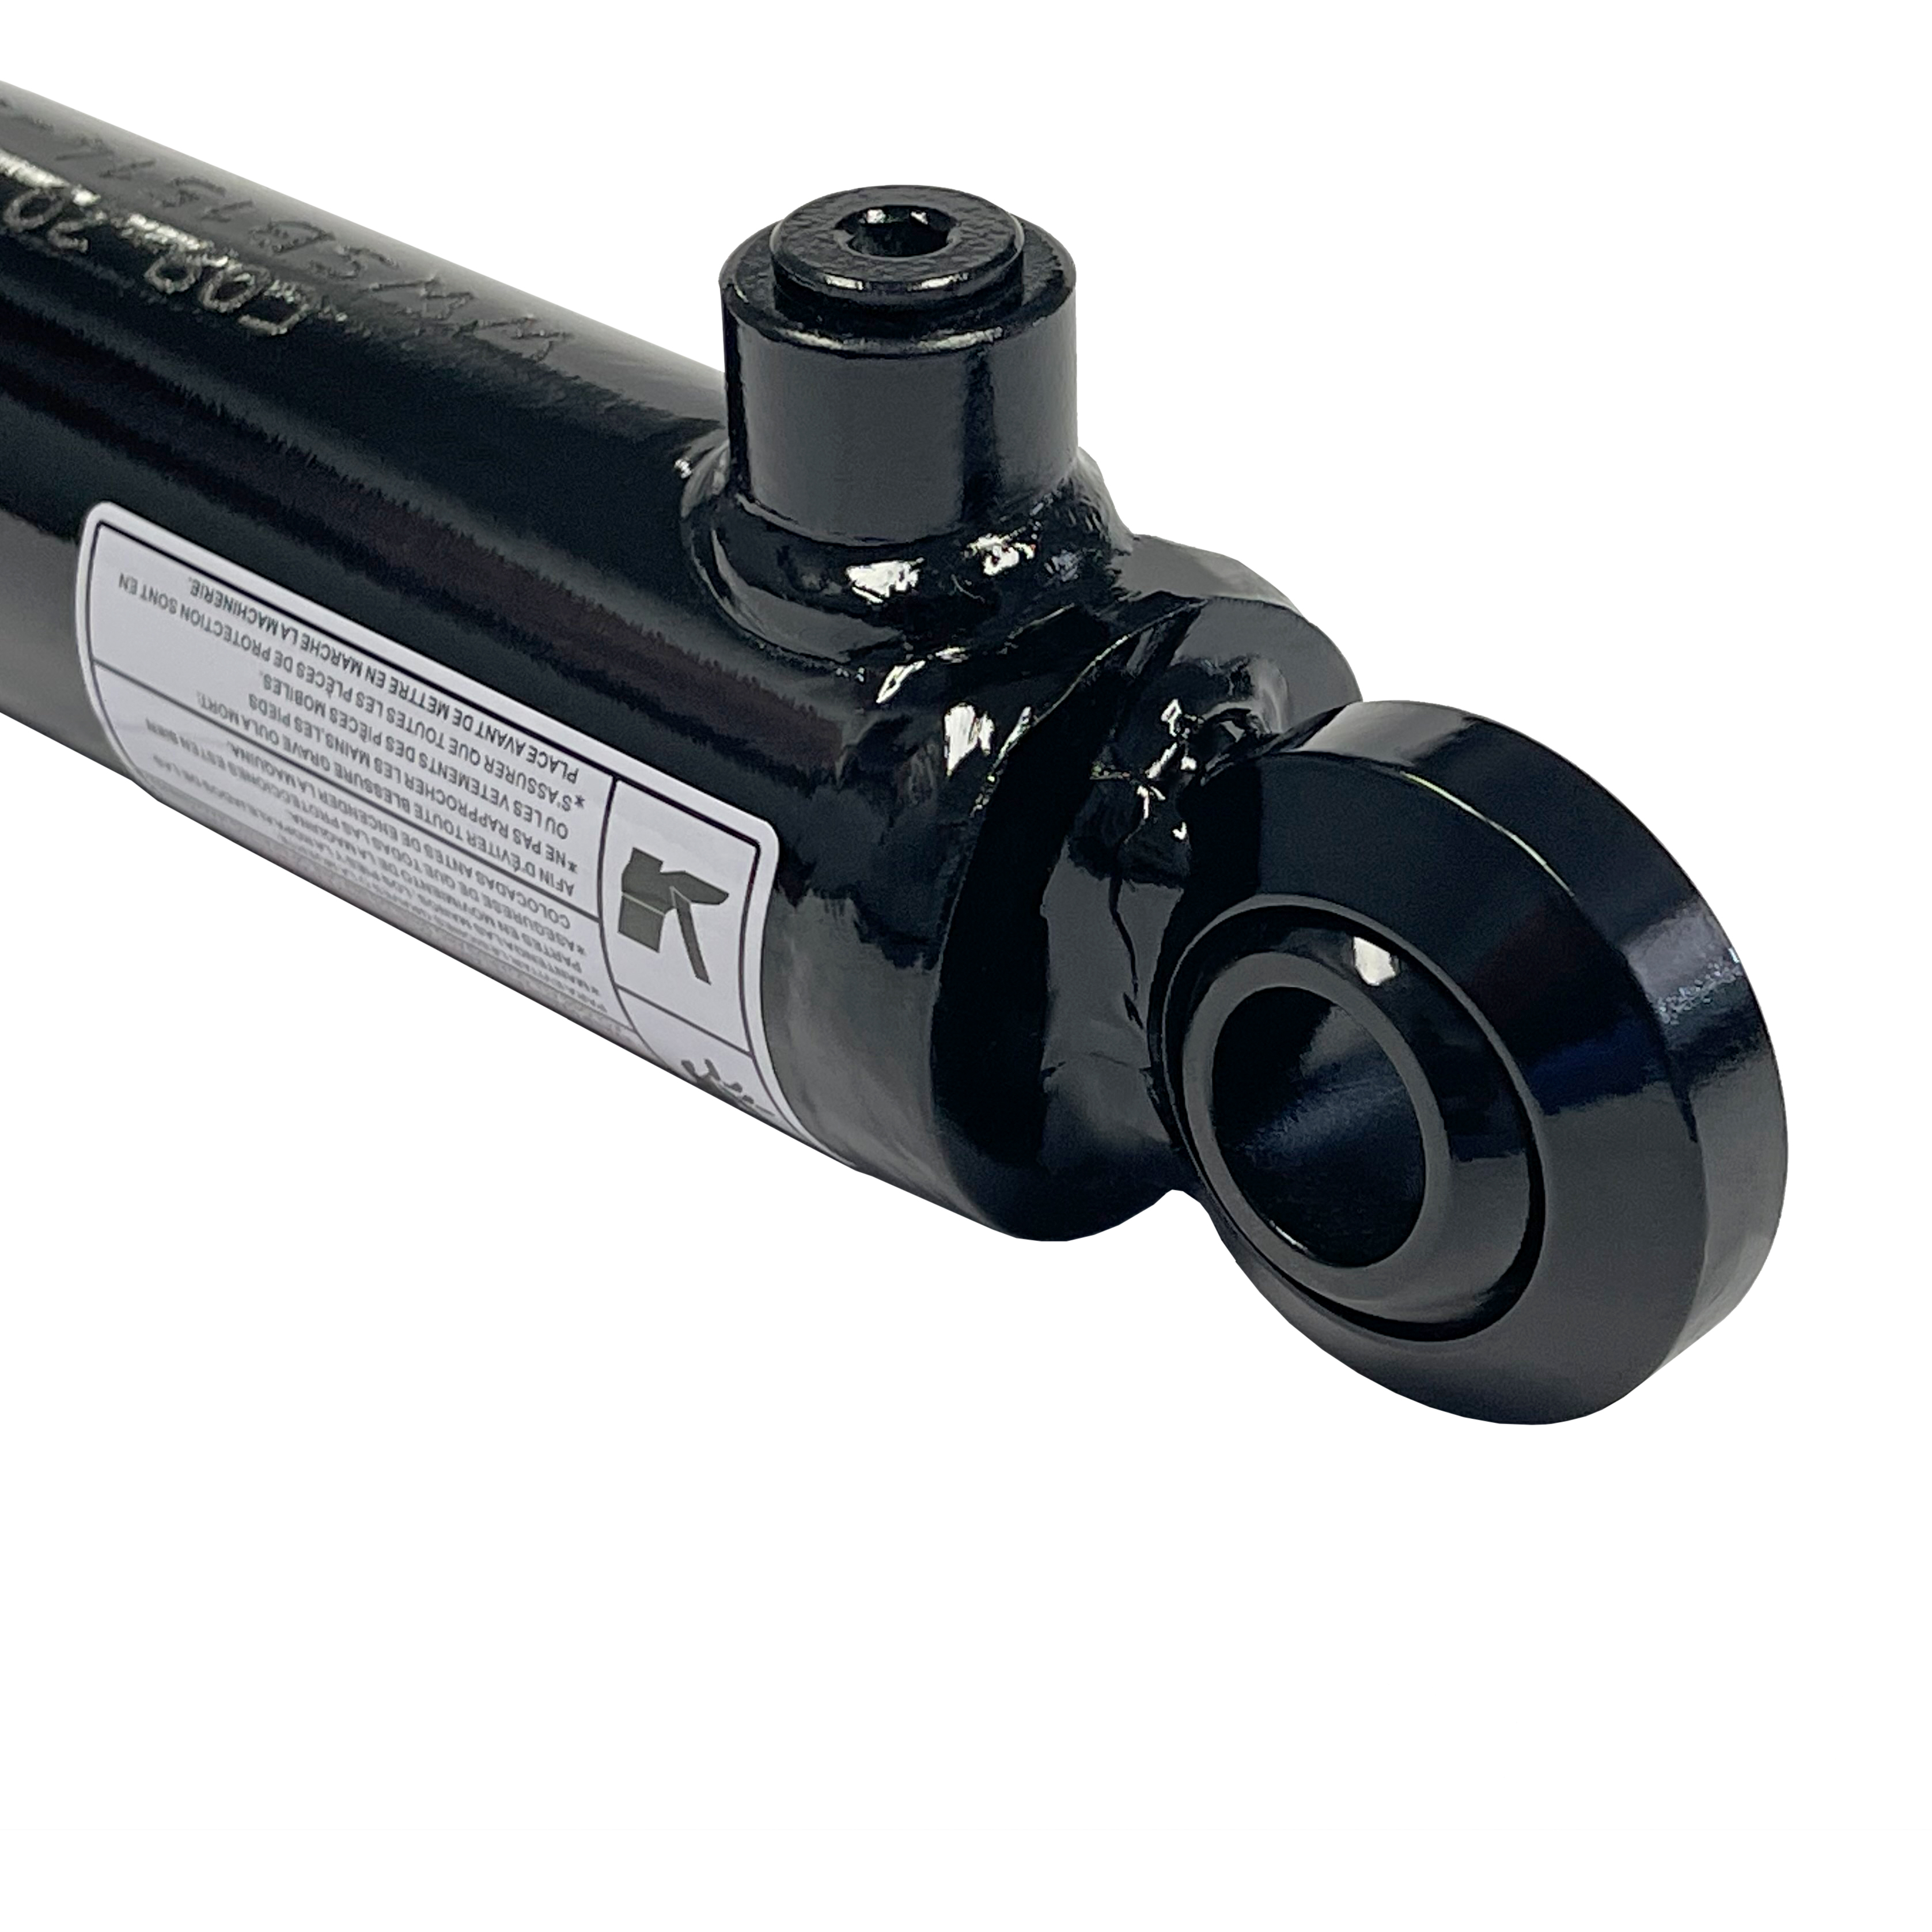 1.5 bore x 4 stroke swivel eye hydraulic cylinder, welded swivel eye double acting cylinder | Prince Hydraulics